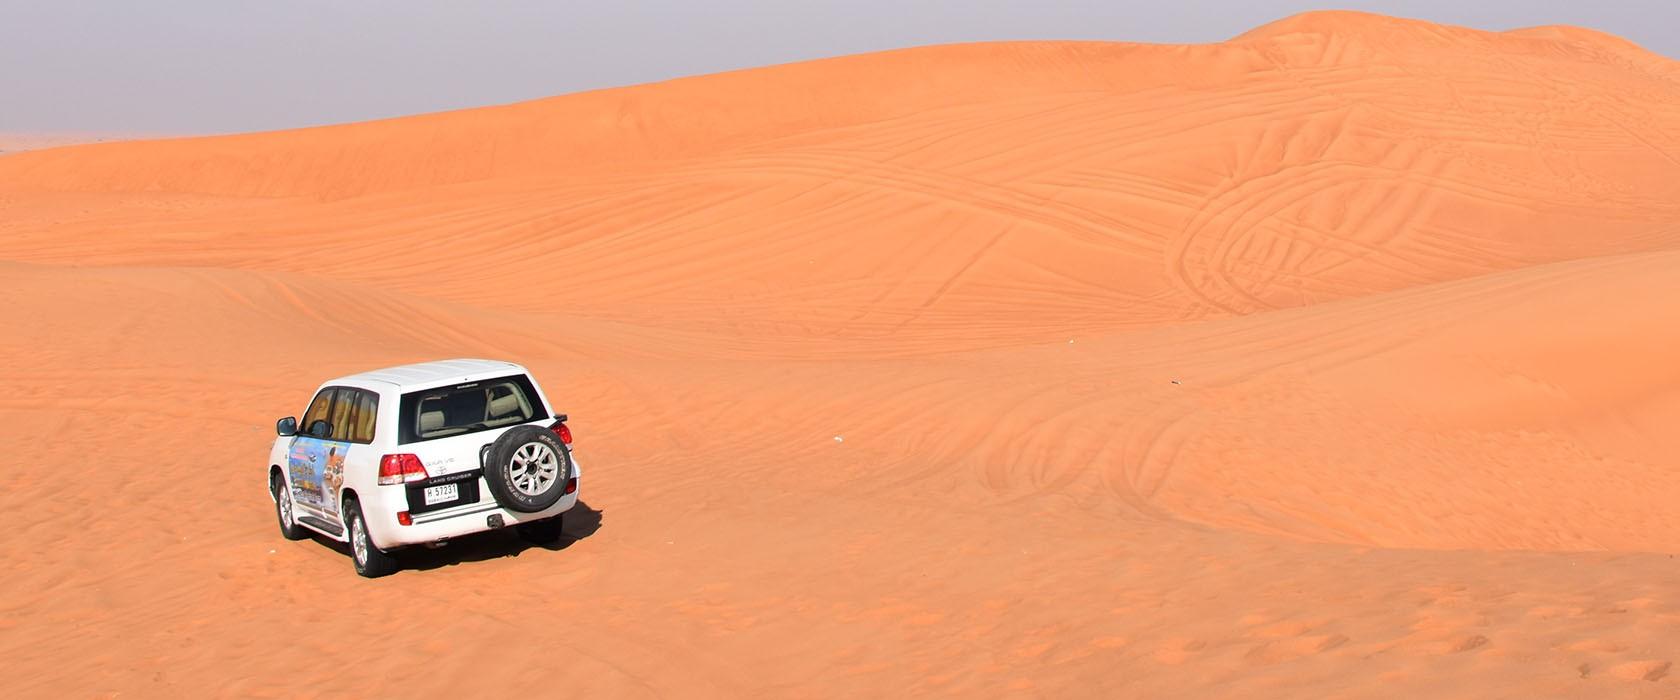 Ochtendsafari in de woestijn van Dubai